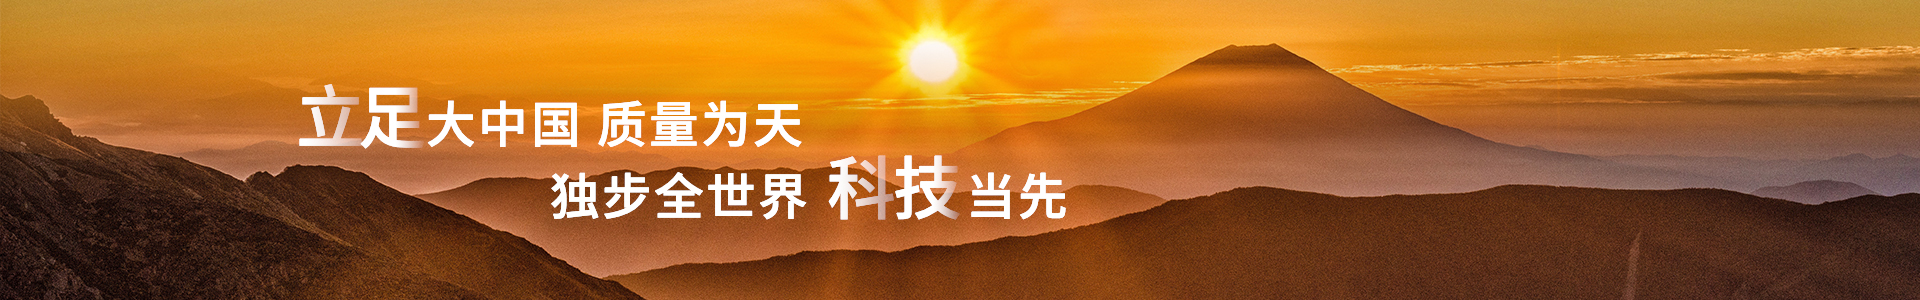 banner1(1)